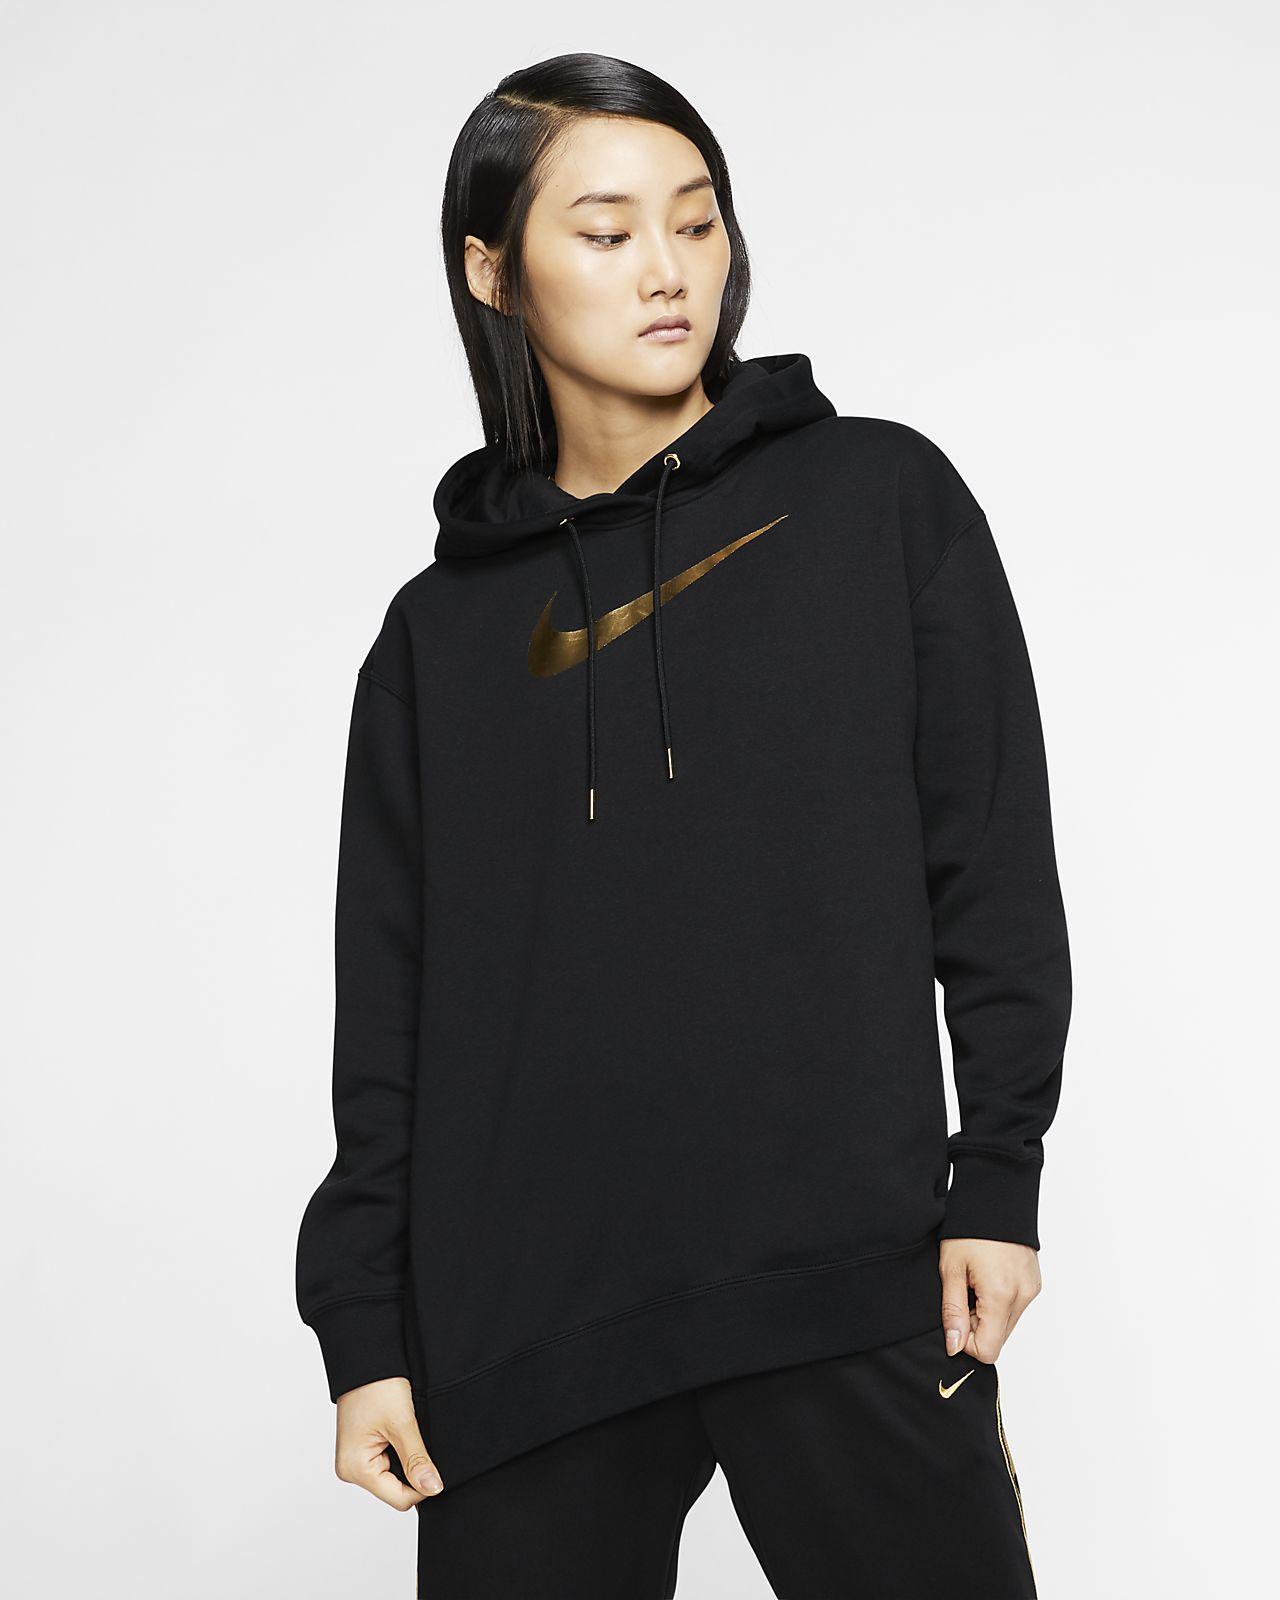 Capucha Para Mujer Sportswear Sudadera Con Nike kZOuwXPiT